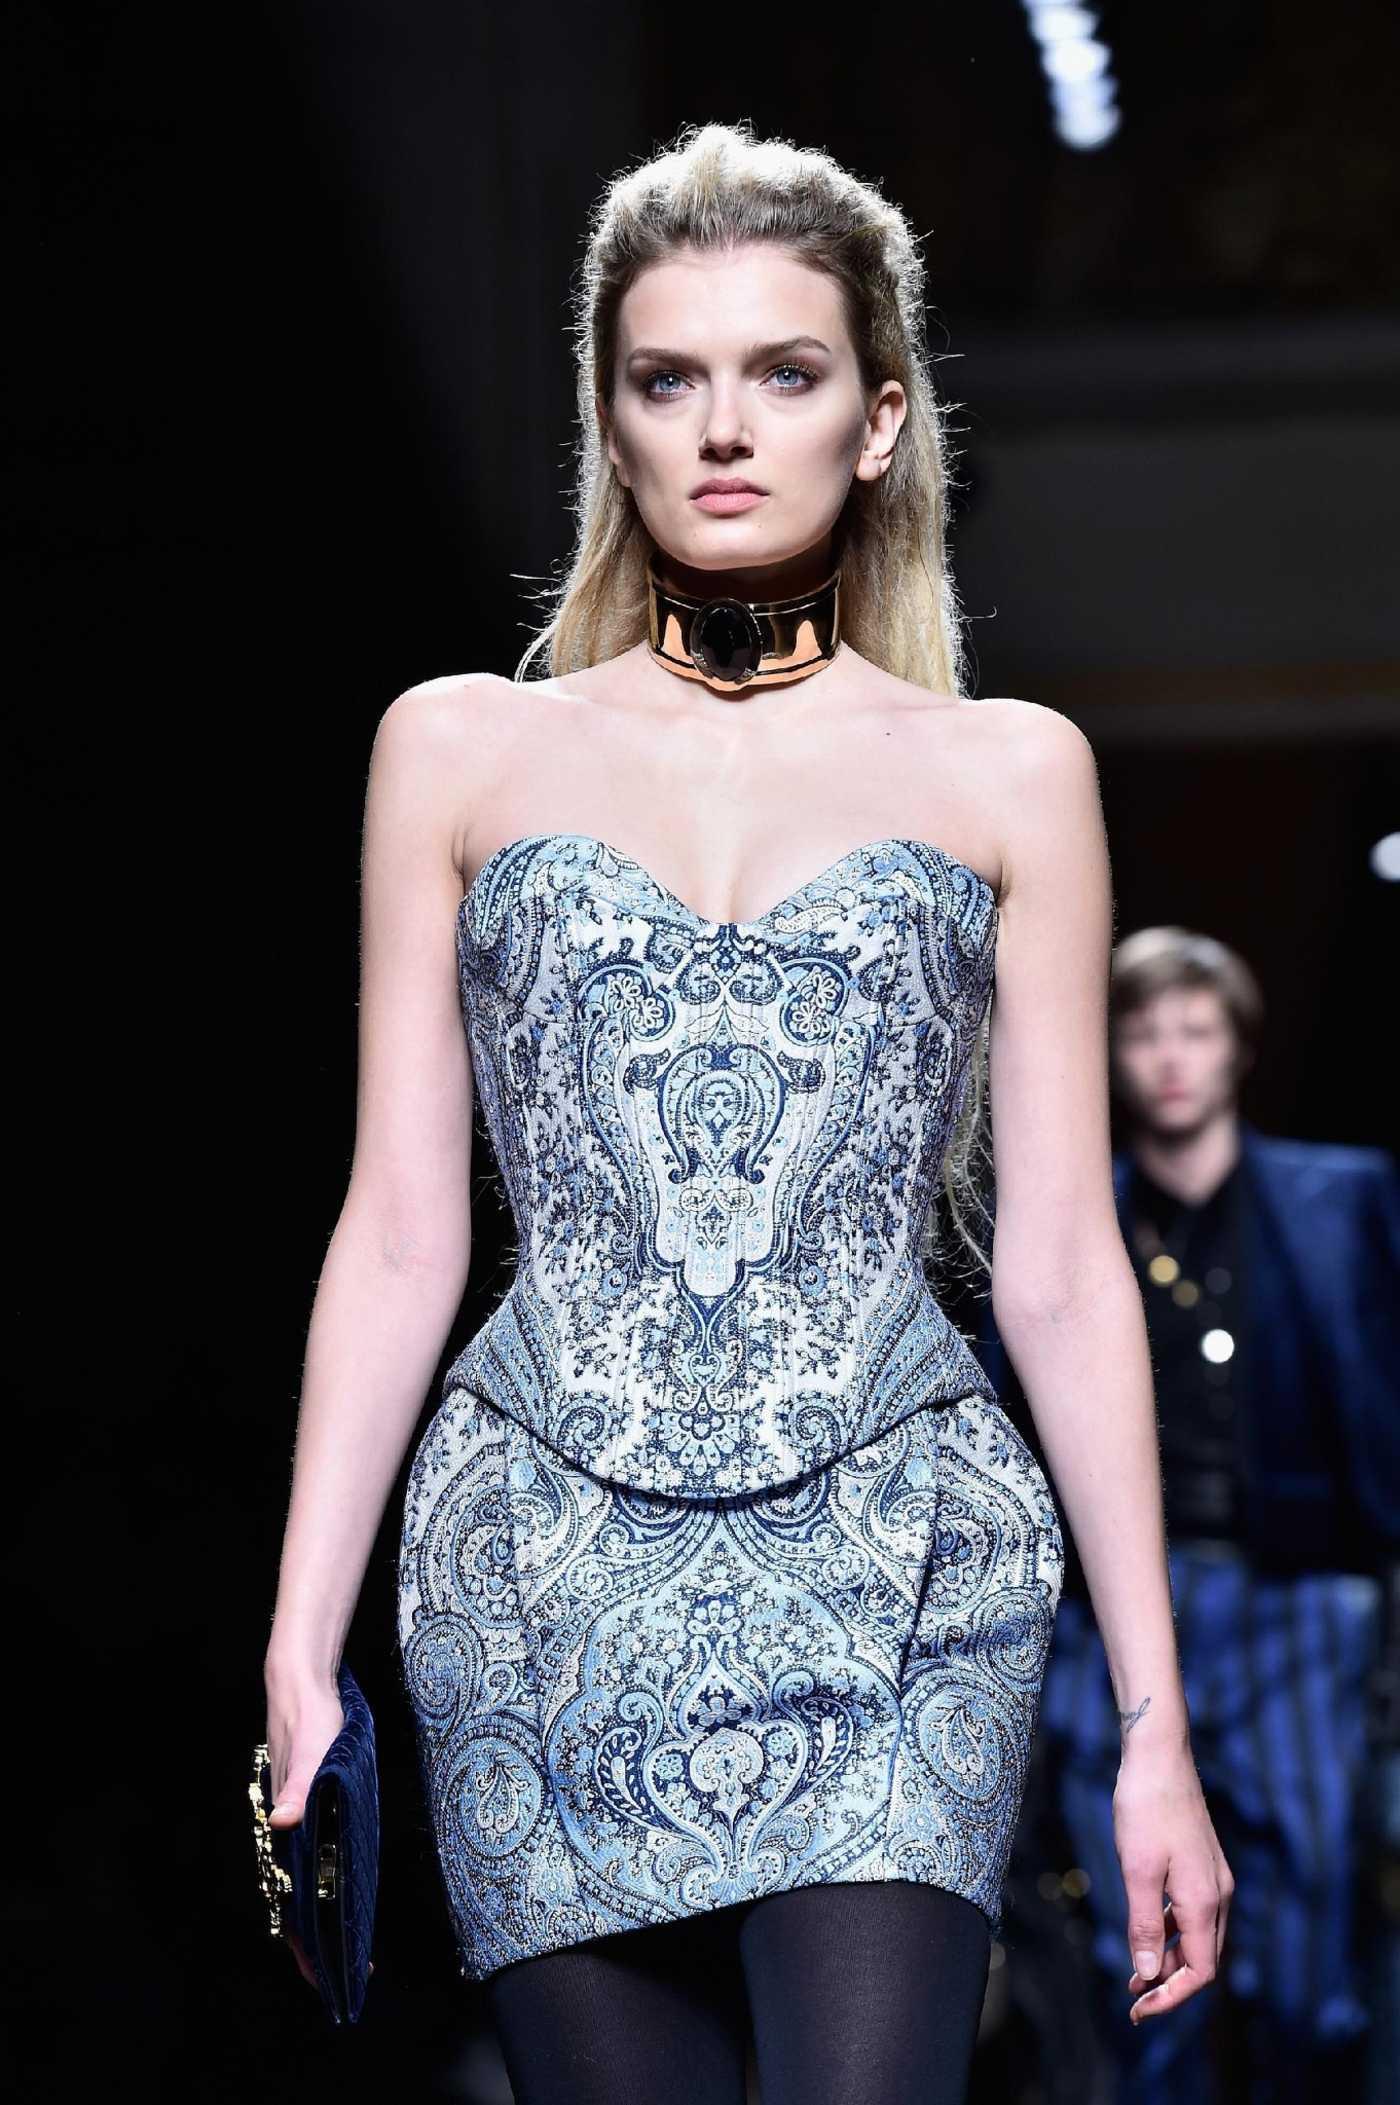 Lily Donaldson Balmain Fashion Show in Paris